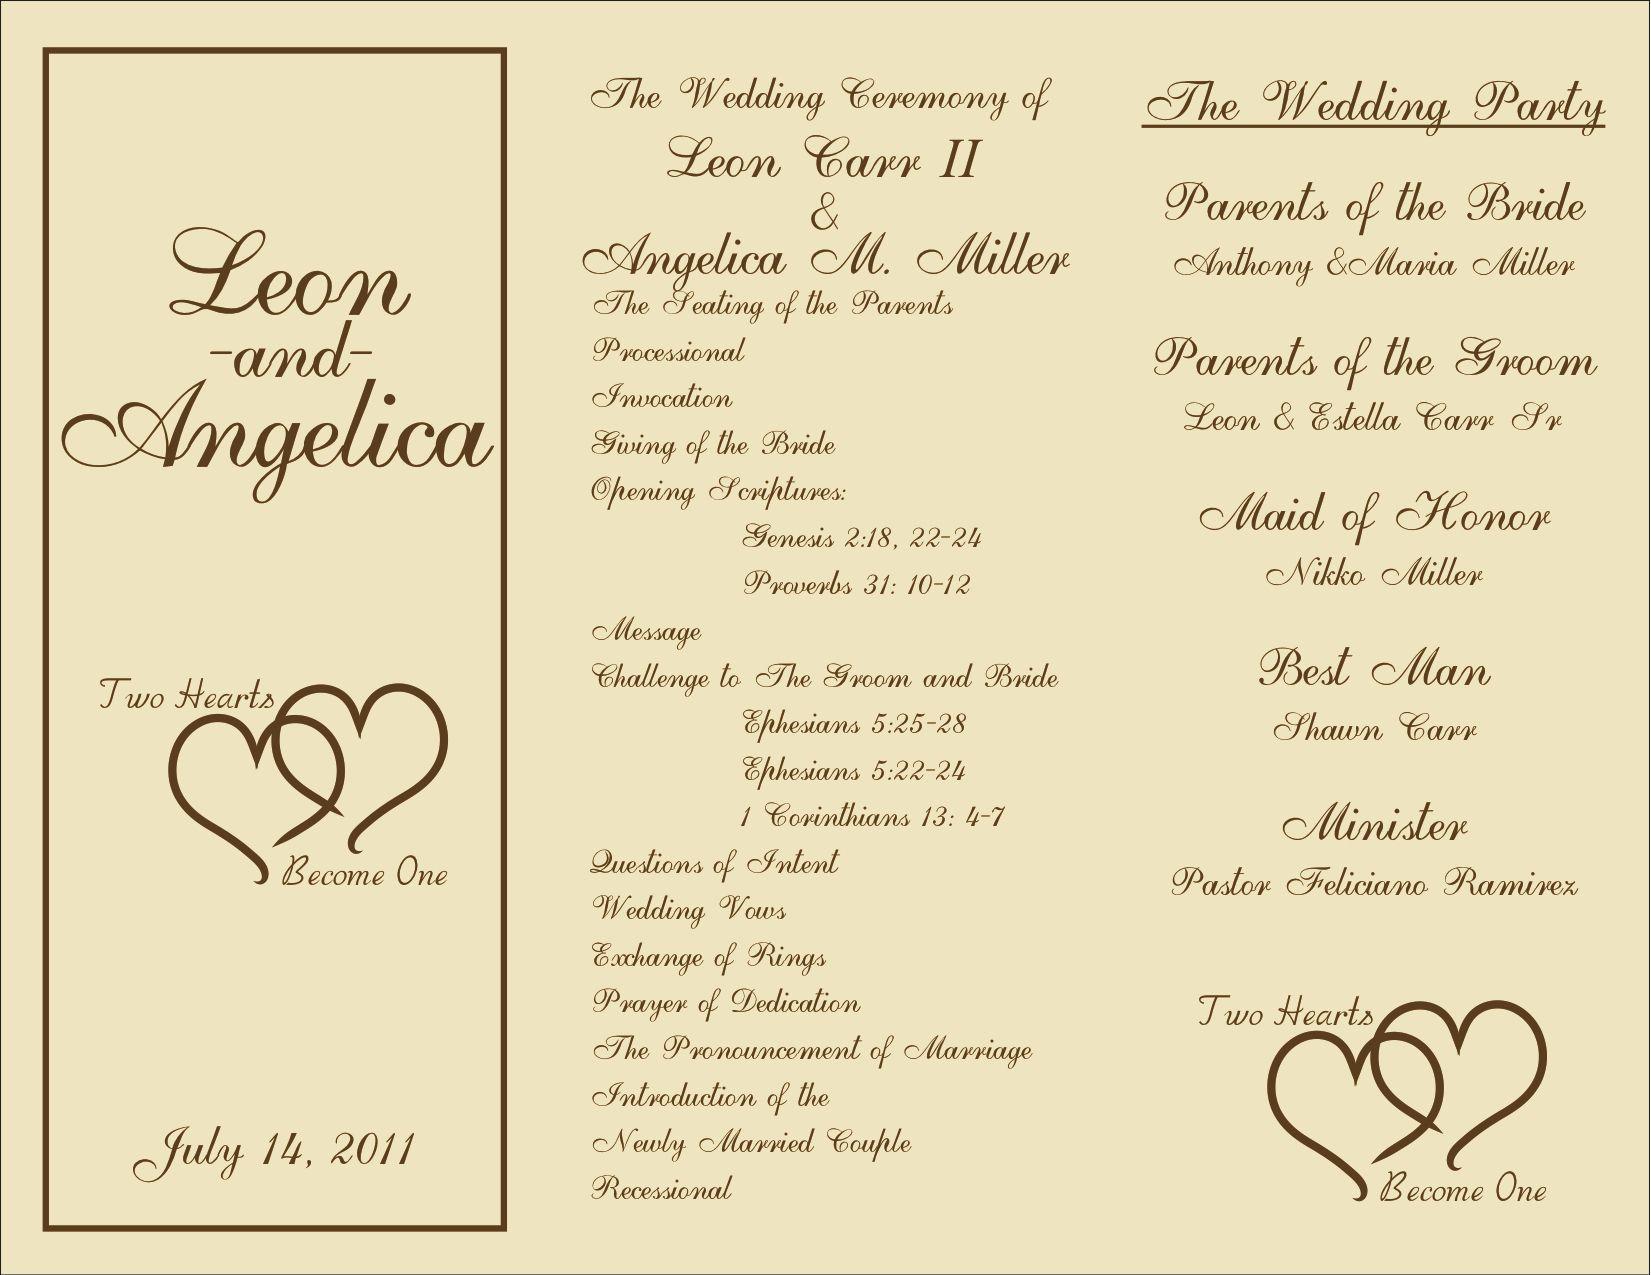 005 Wonderful Free Wedding Ceremony Program Template Picture  Catholic DownloadFull